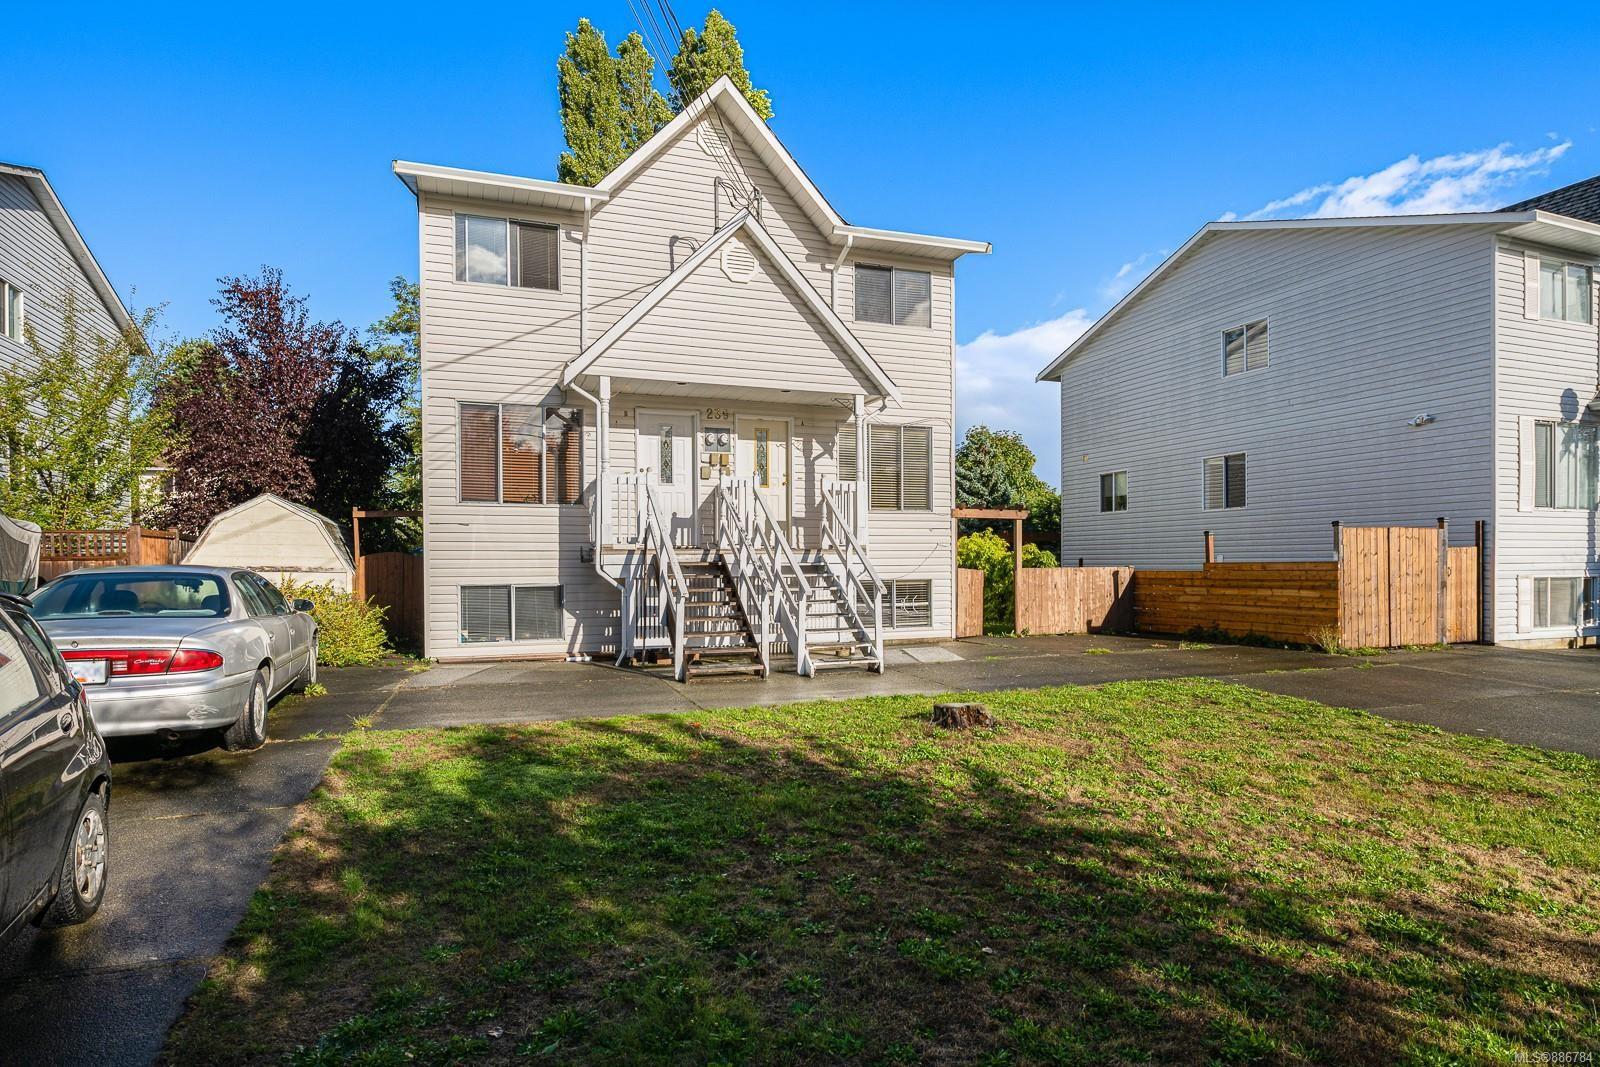 Main Photo: 239B Mitchell Pl in : CV Courtenay City Half Duplex for sale (Comox Valley)  : MLS®# 886784